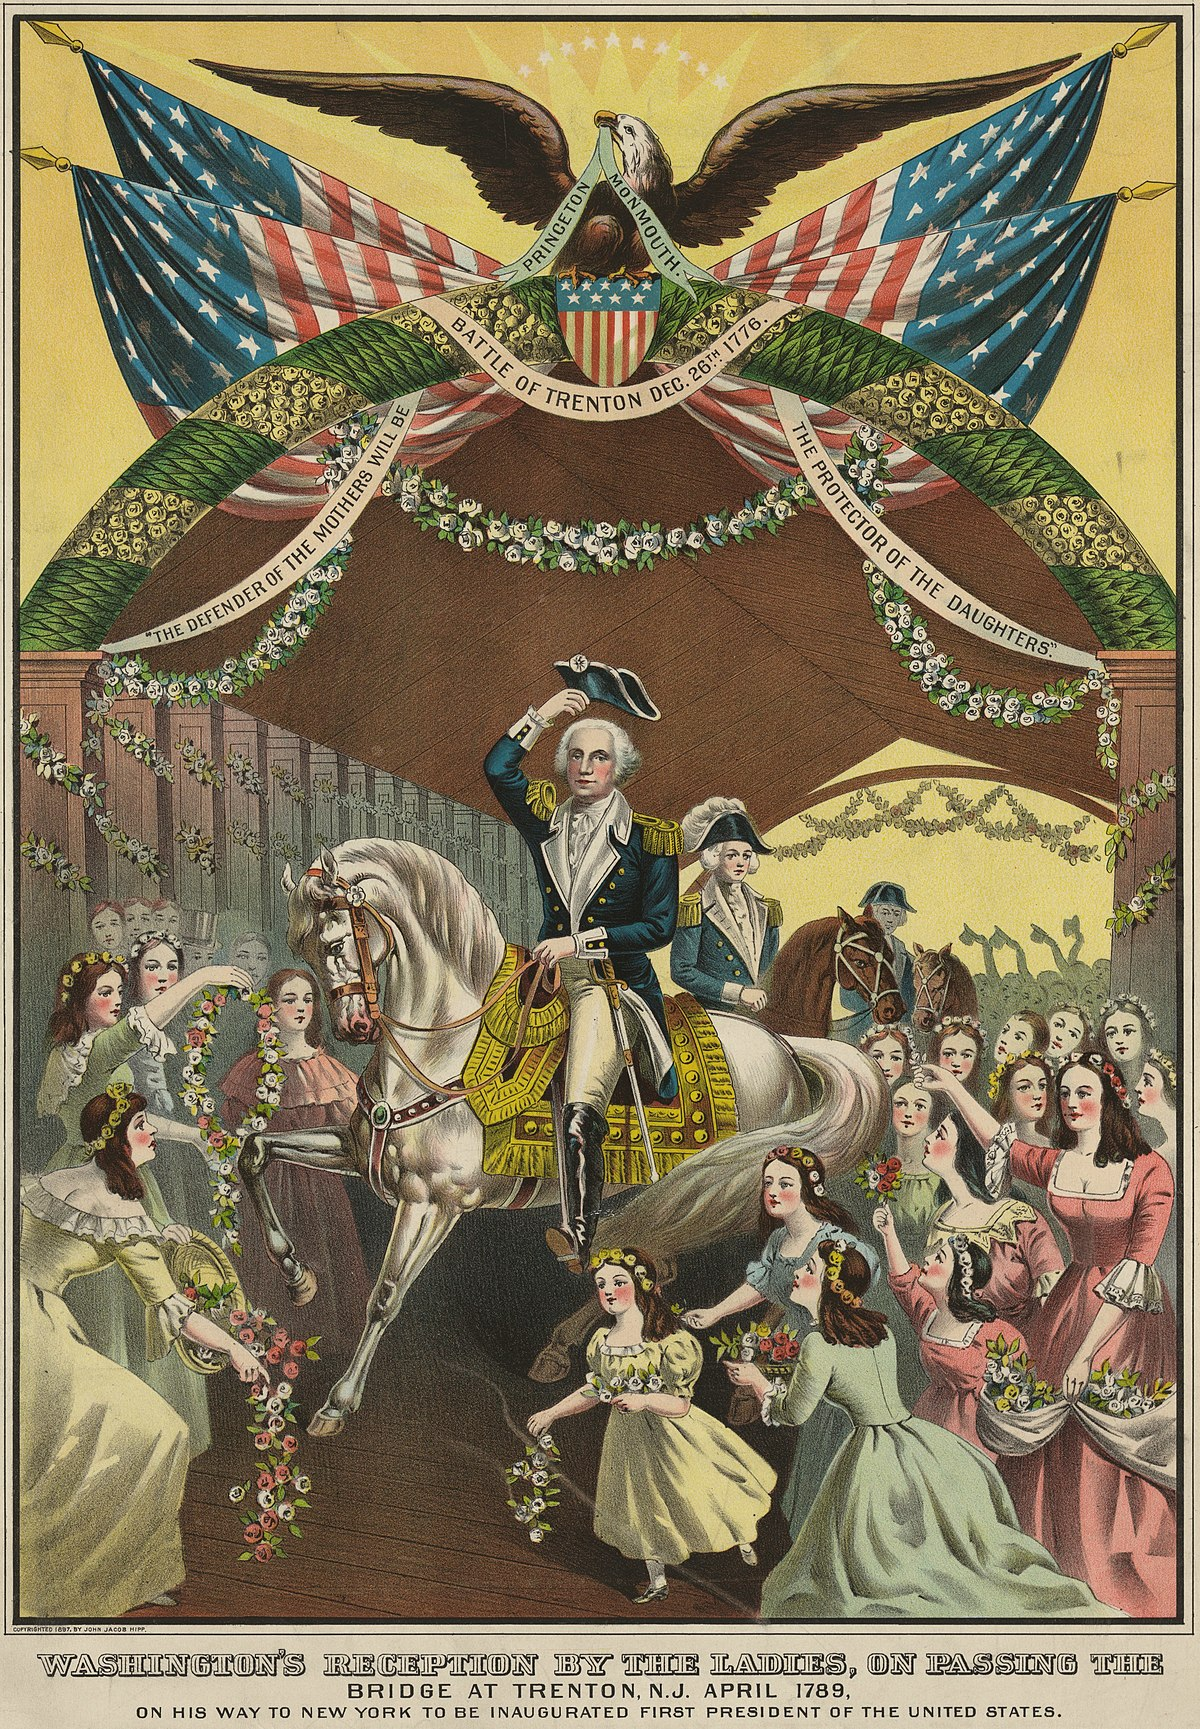 George Washington's Reception At Trenton